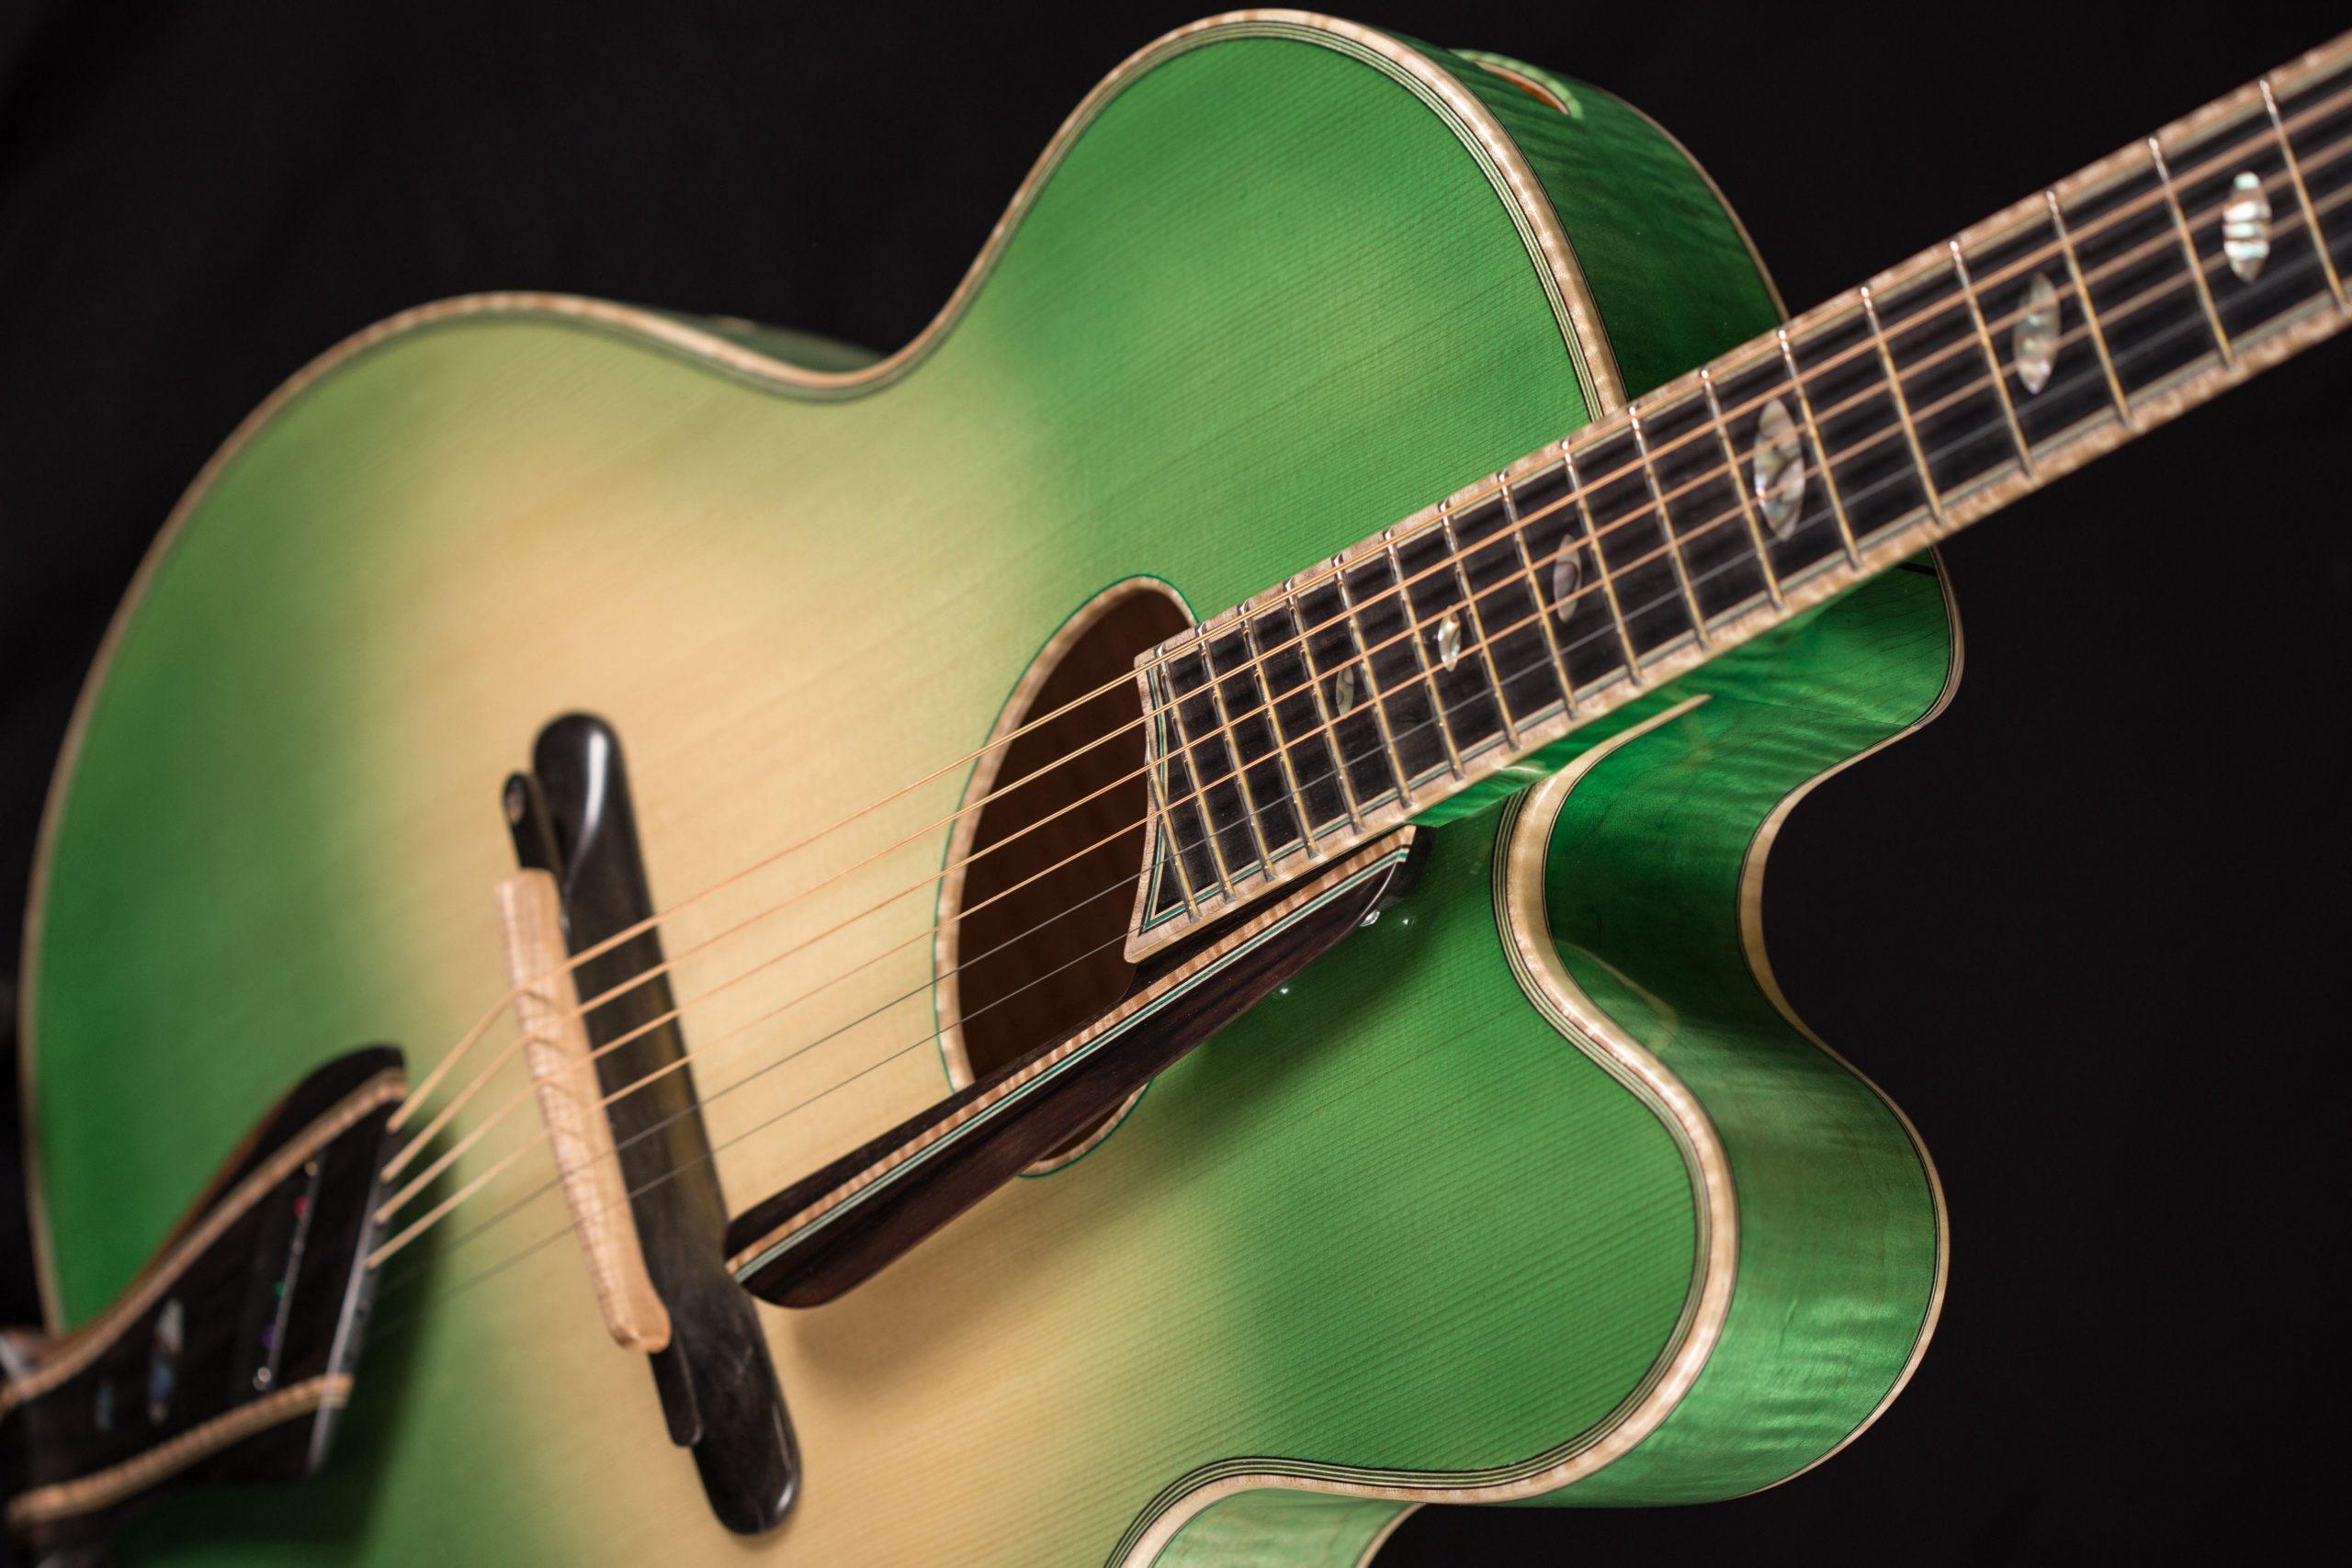 mirabella guitars oval hole sativa guitar